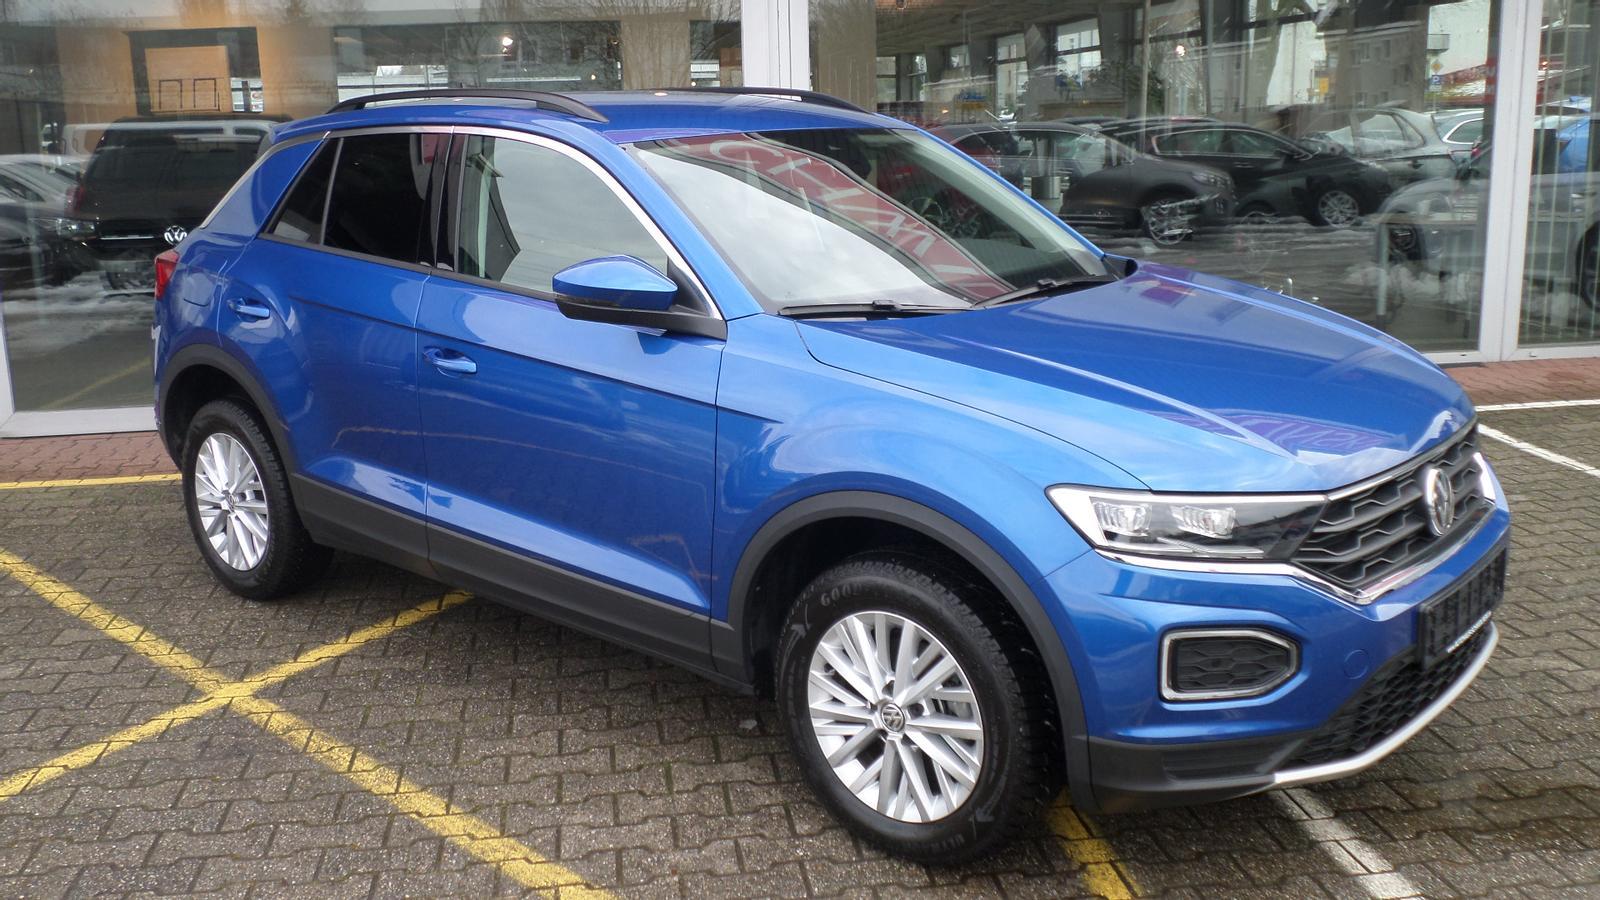 Volkswagen T-Roc DSG 1.5 16V TSI el. Heckklappe Kamera LED, Jahr 2019, Benzin